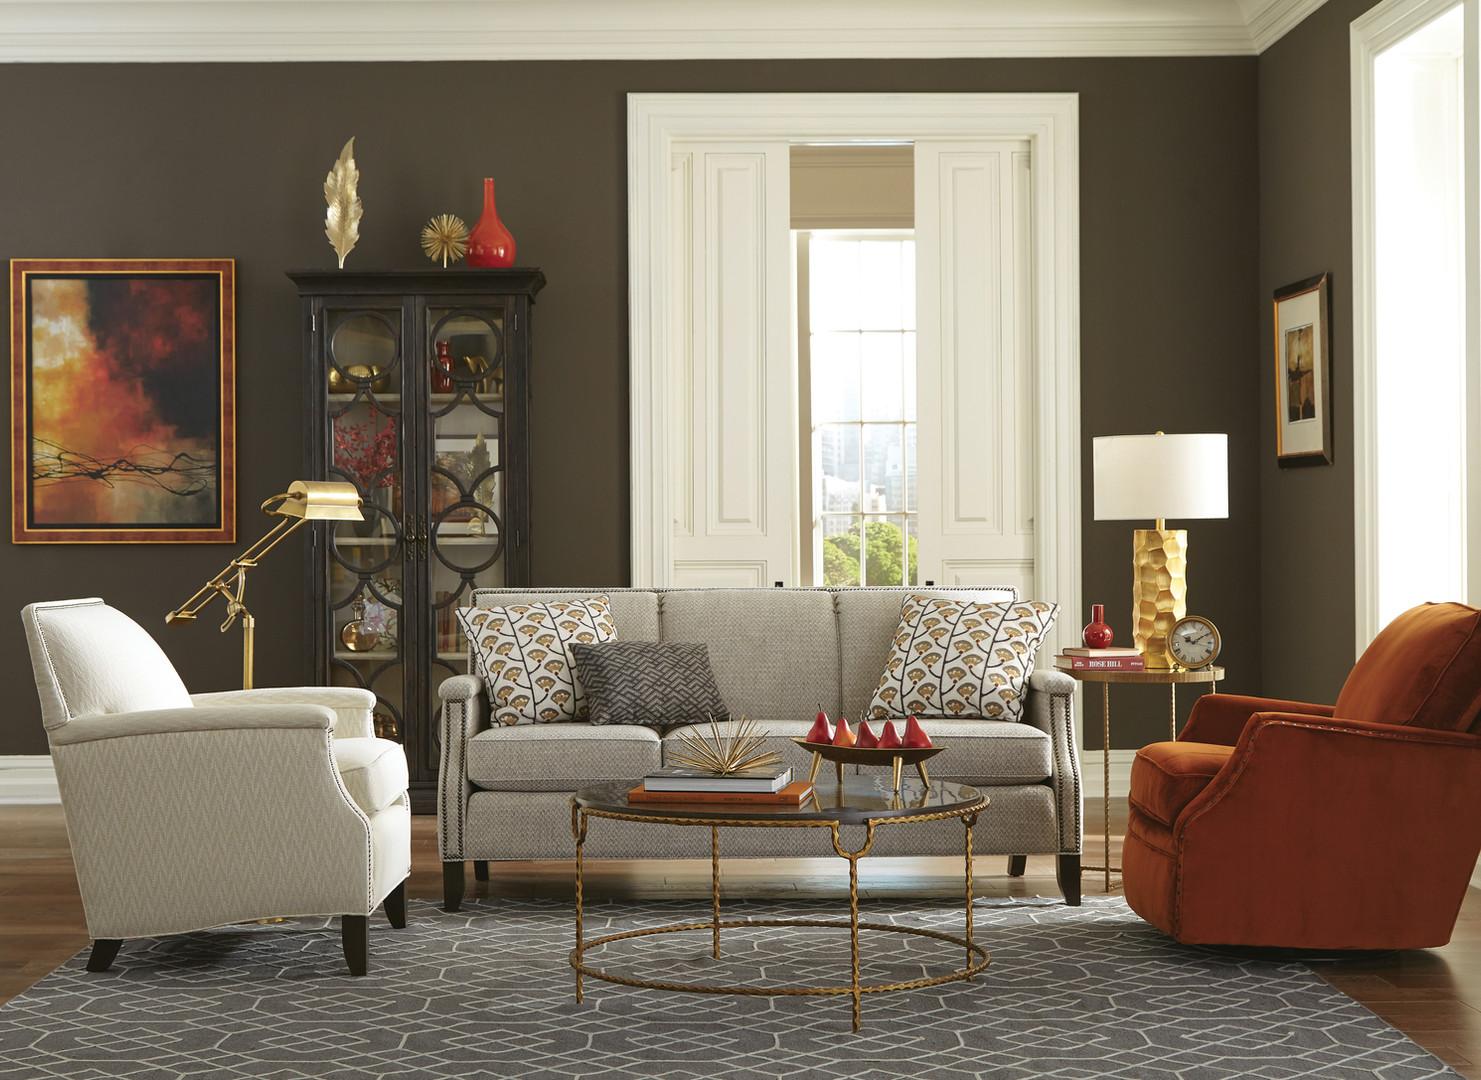 251-fabric-midsize sofa, 526.jpg